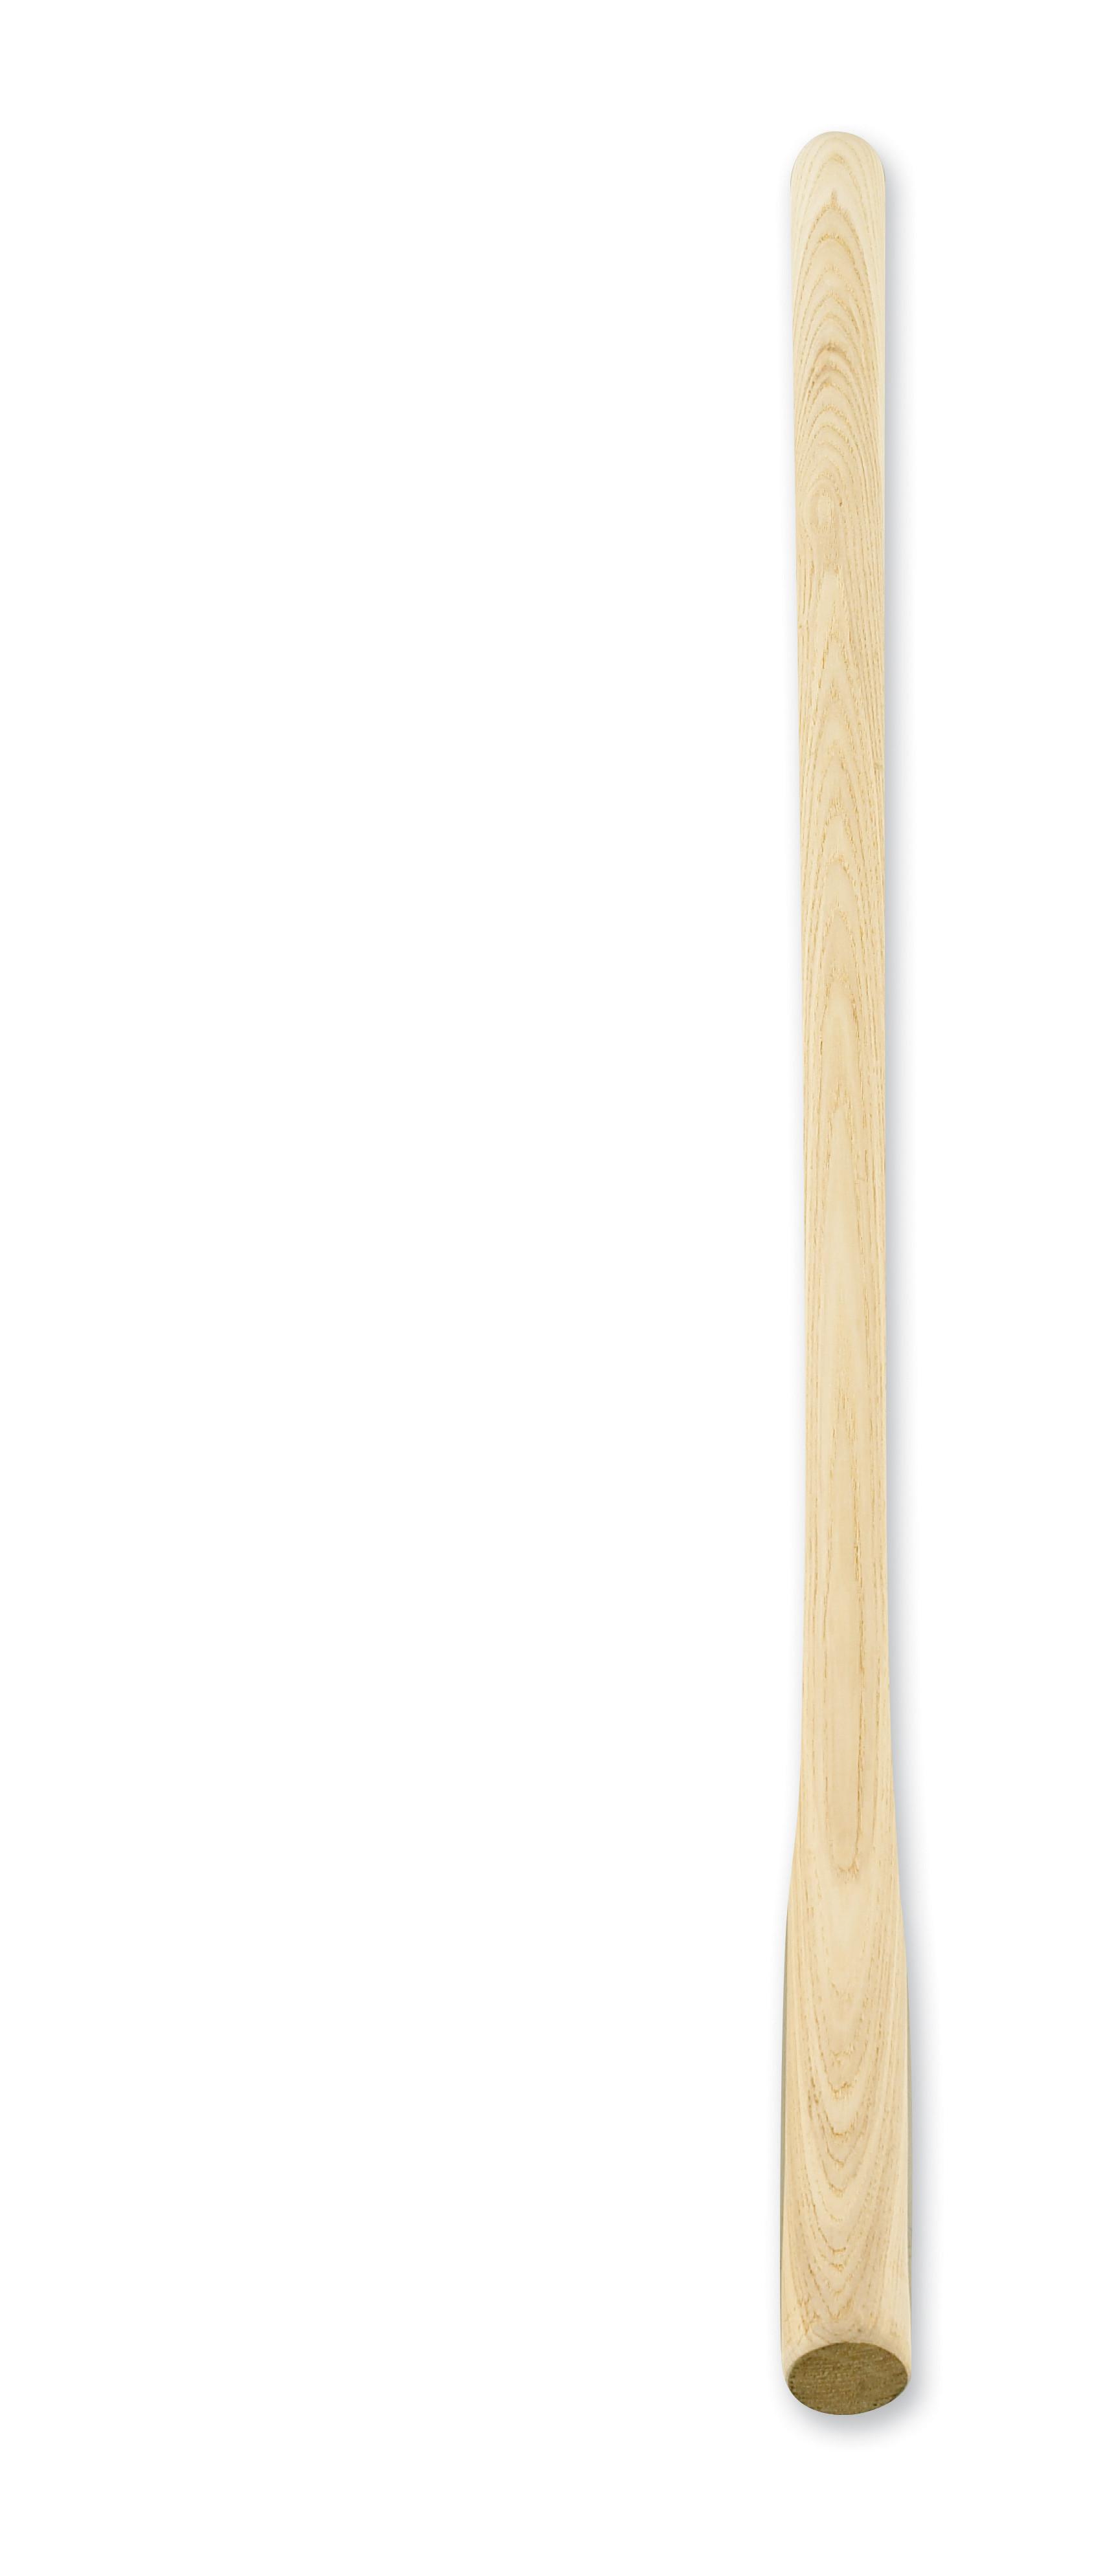 Wood Maul Handle